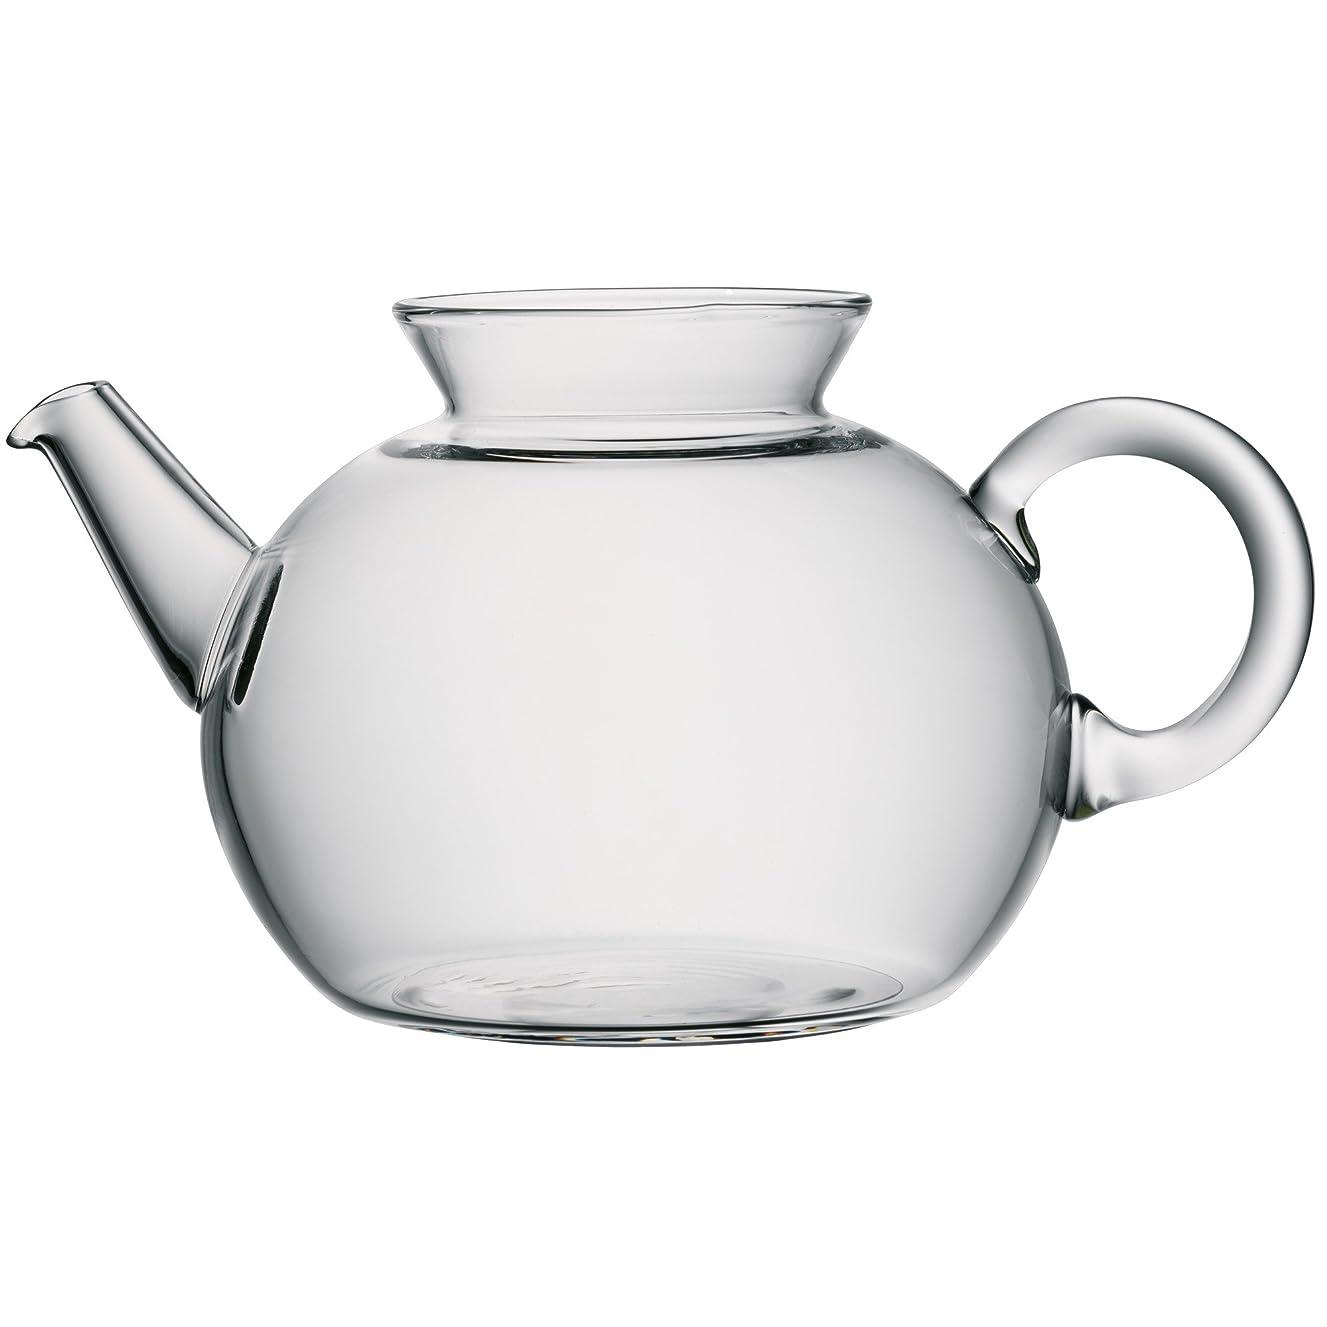 WMF Spare Teapot Concept, 6081439990